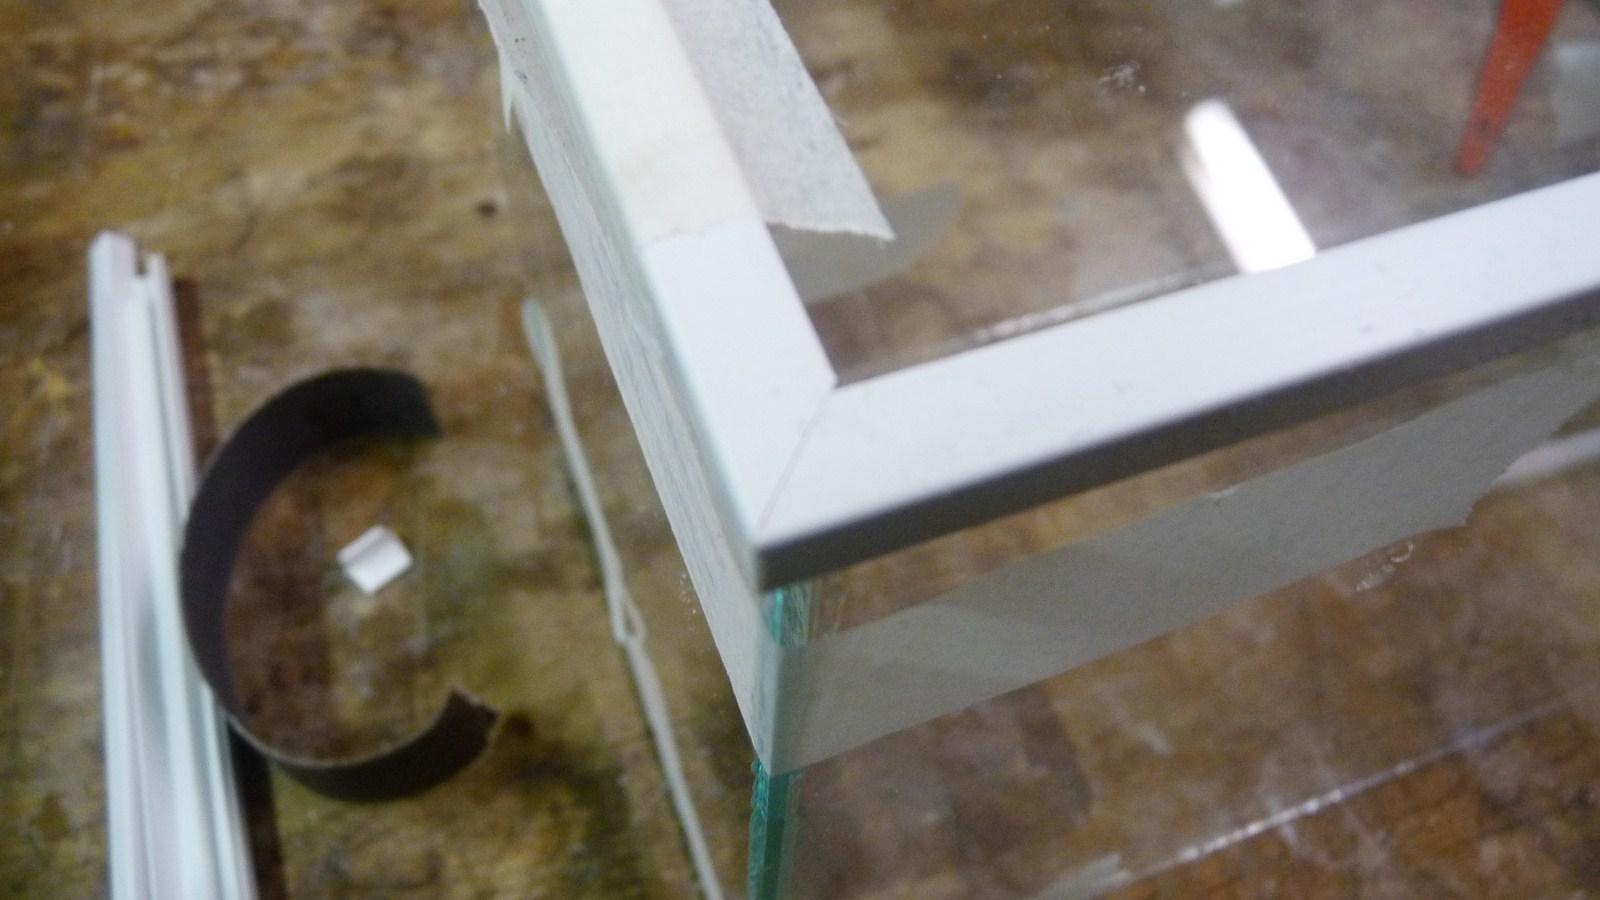 Fabriquer ses propres vitrines en verre 17071907265323134915156553